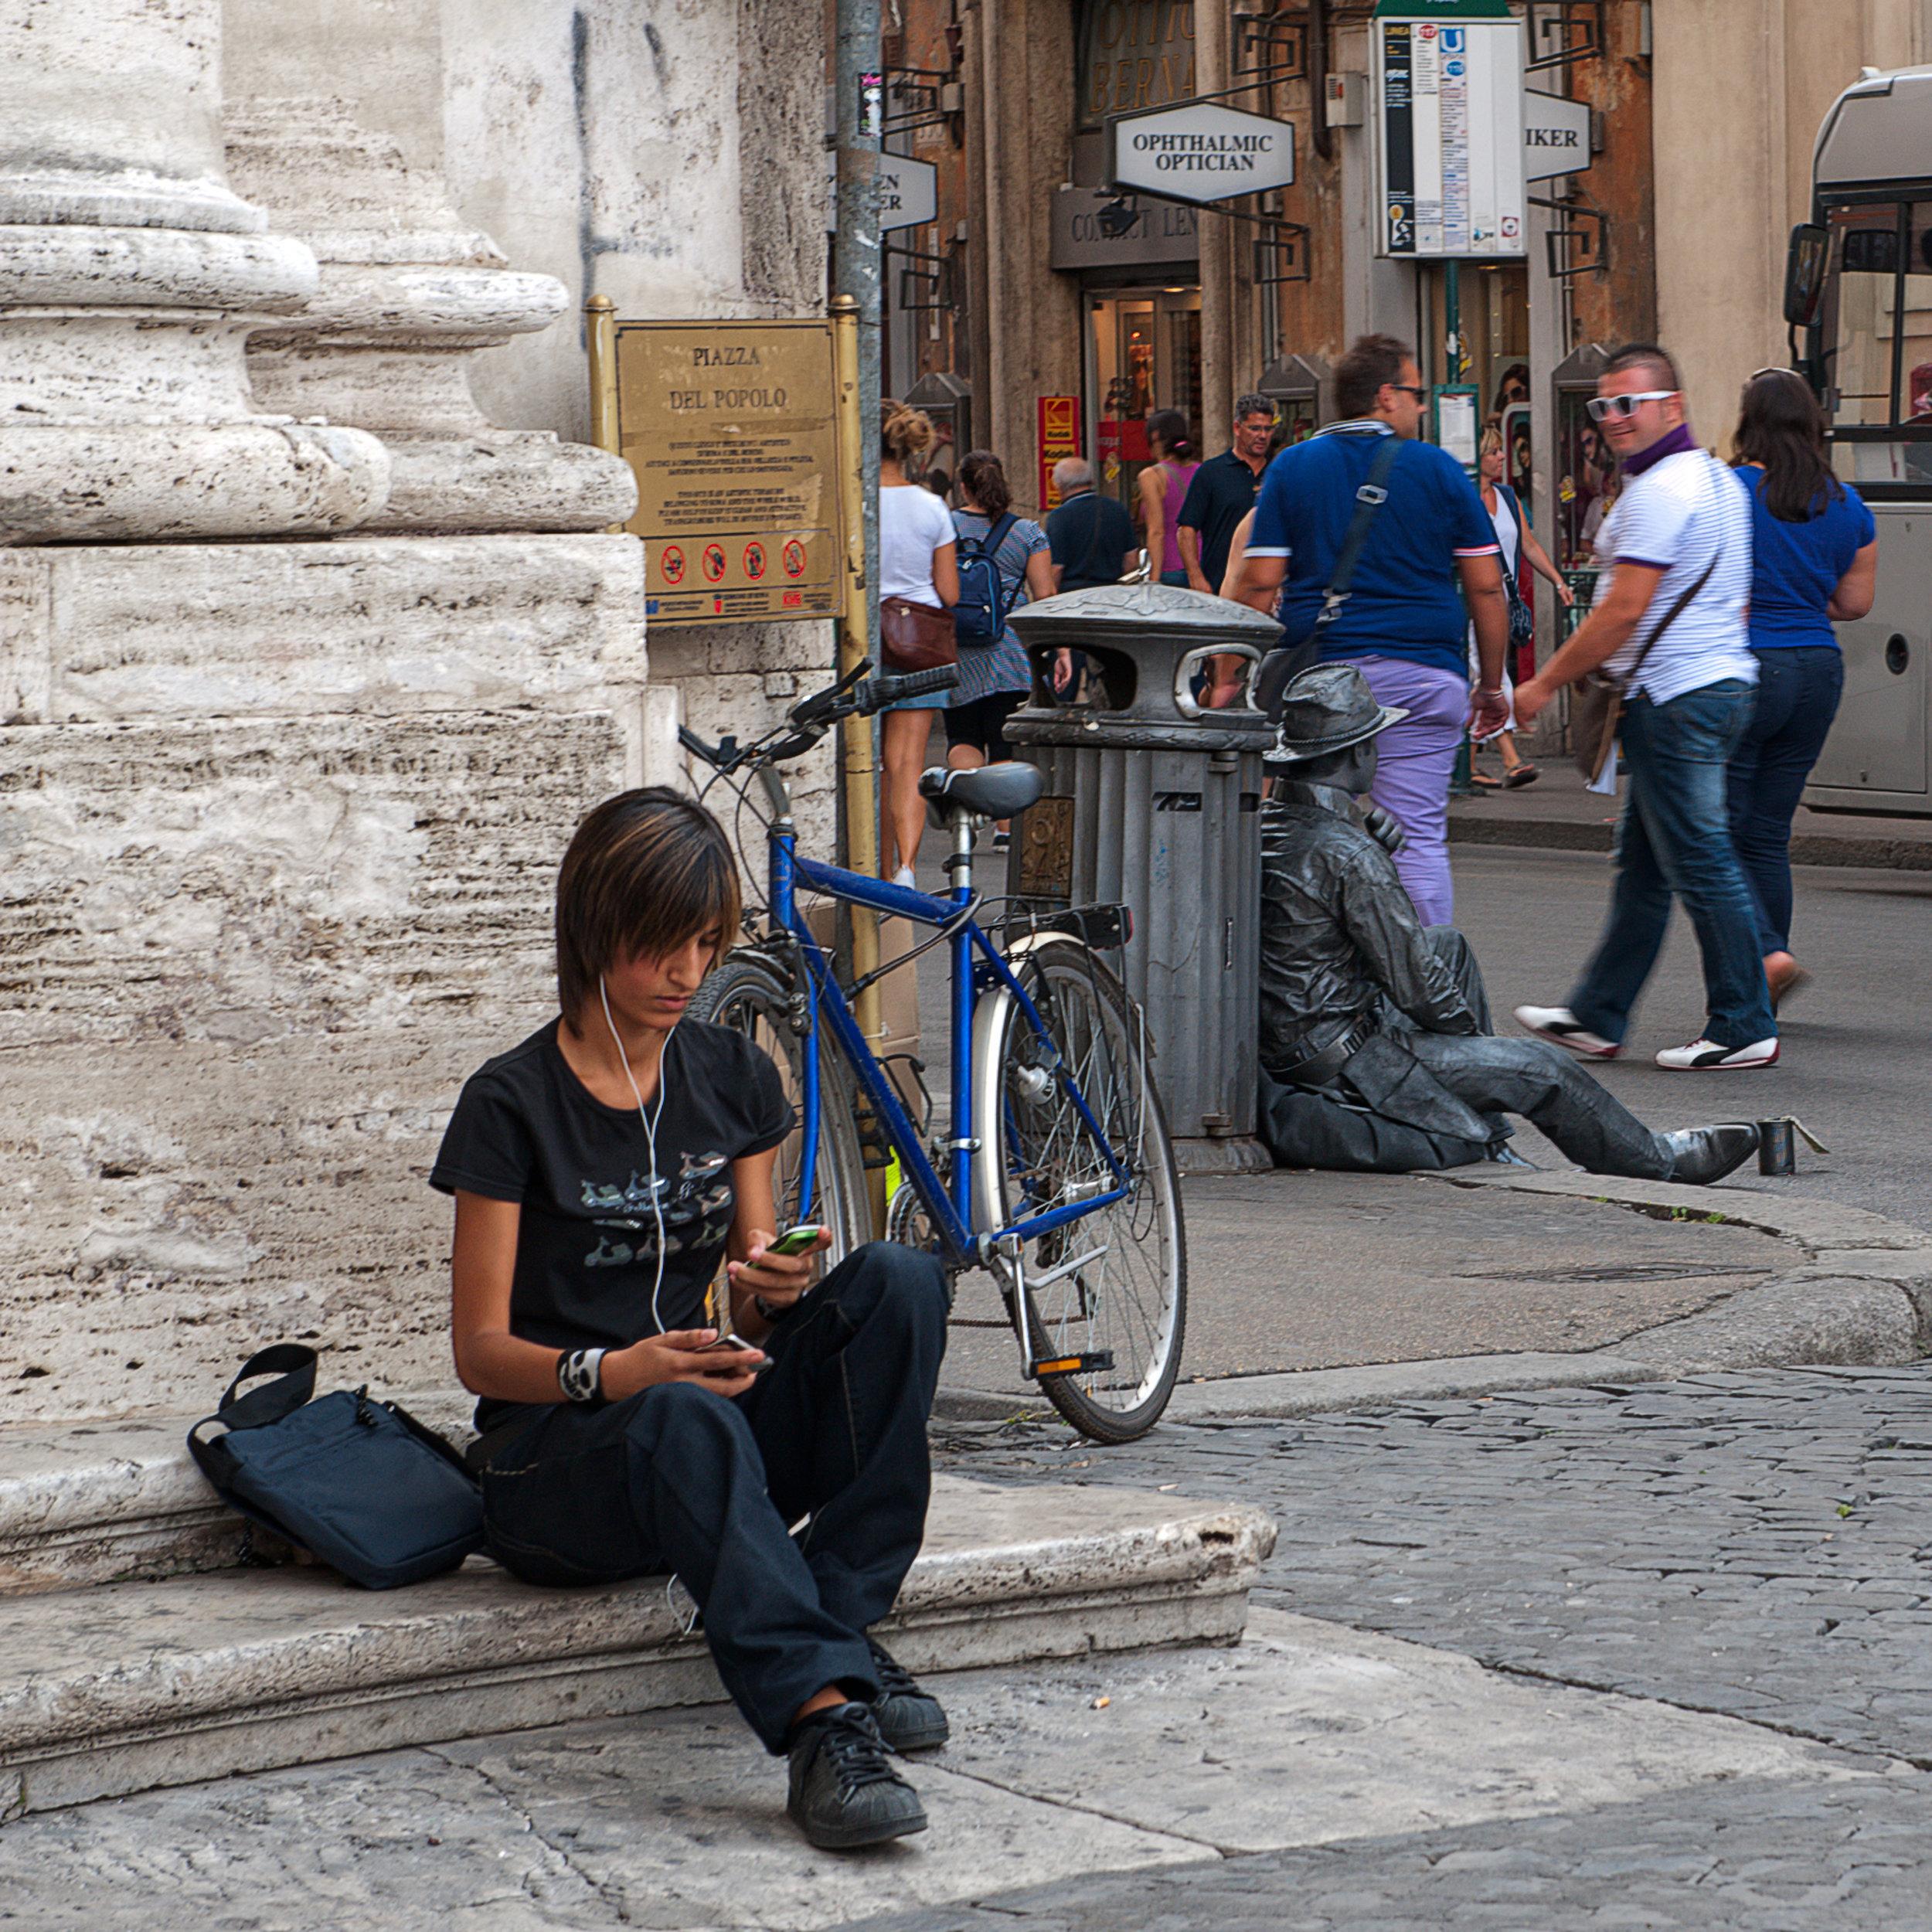 Italy-John Bardell-0743a.jpg